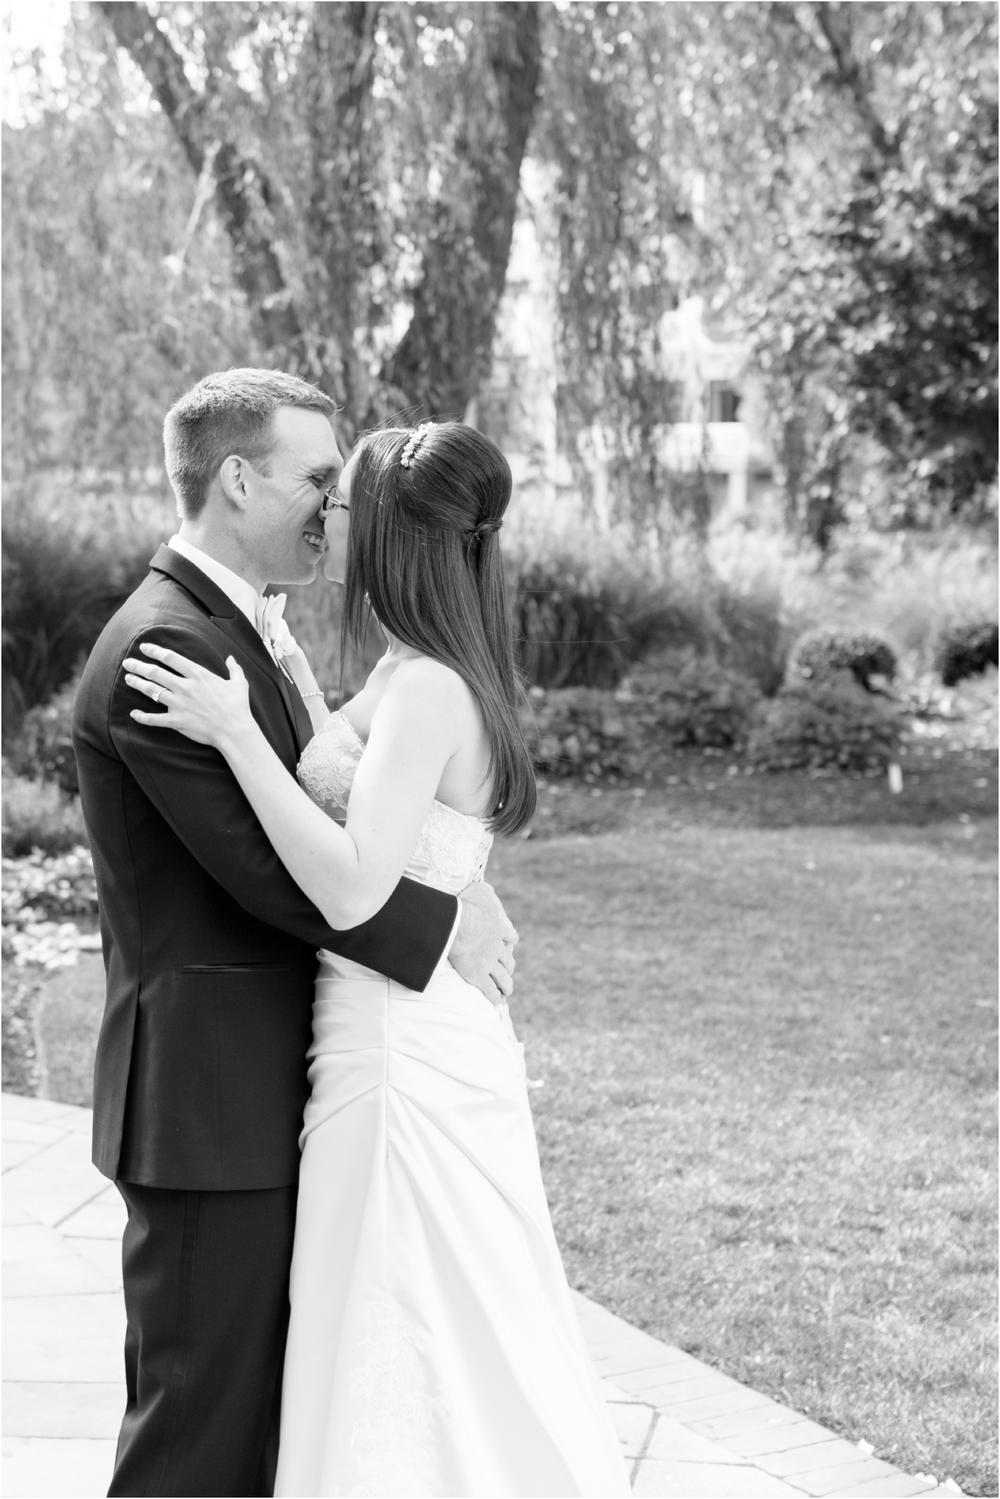 Elhai-Wedding-2-First-Look-393.jpg